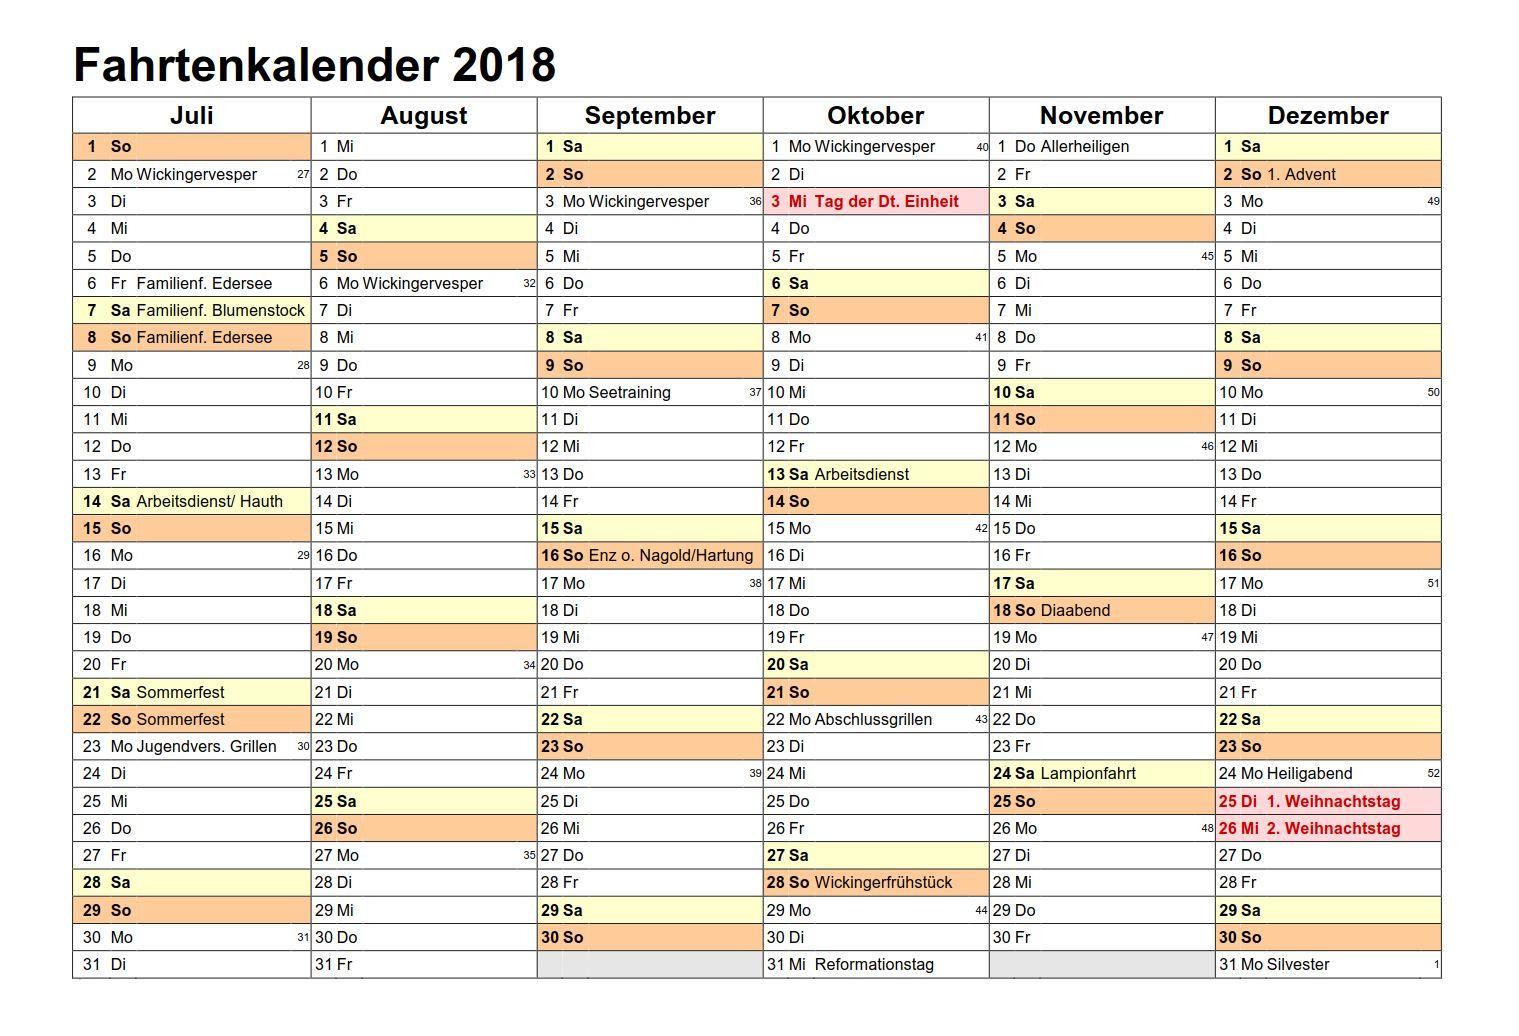 KFW Spöck Fahrtenkalender 2018 (Seite 2)